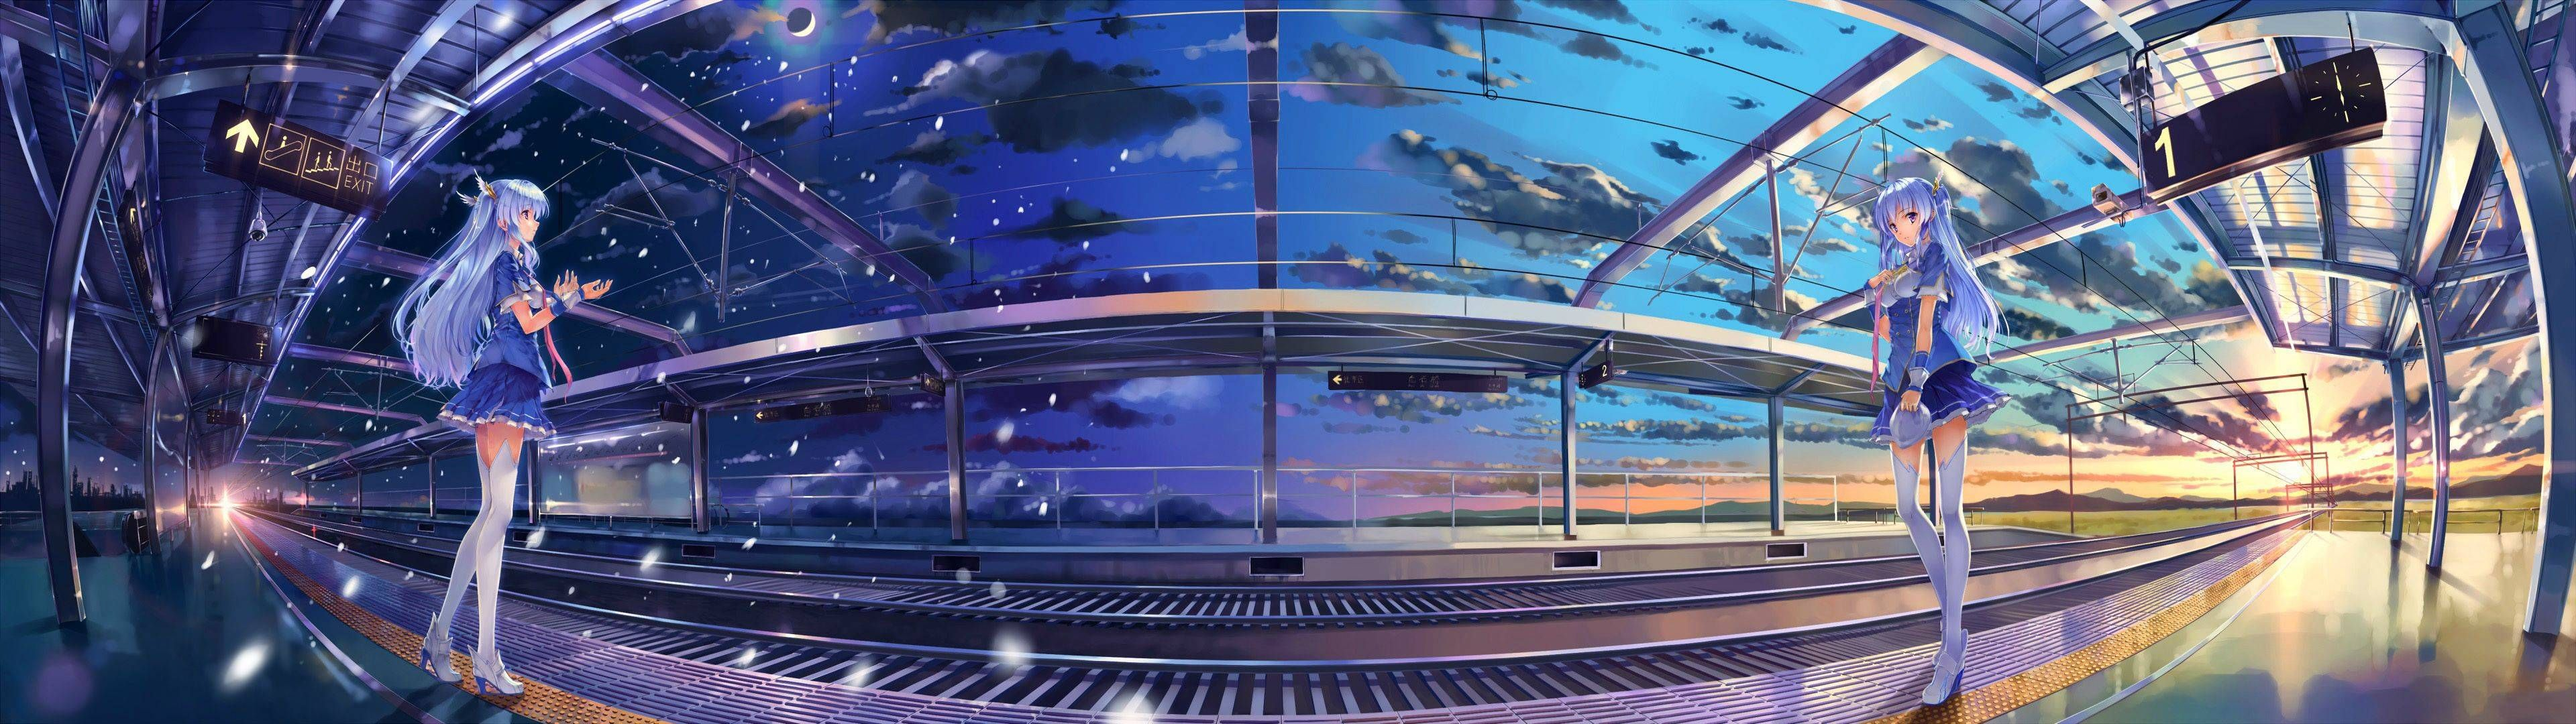 Pics Anime Dual Monitor Download Jpg 3840 1080 Dual Monitor Wallpaper Anime Wallpaper Hd Wallpaper